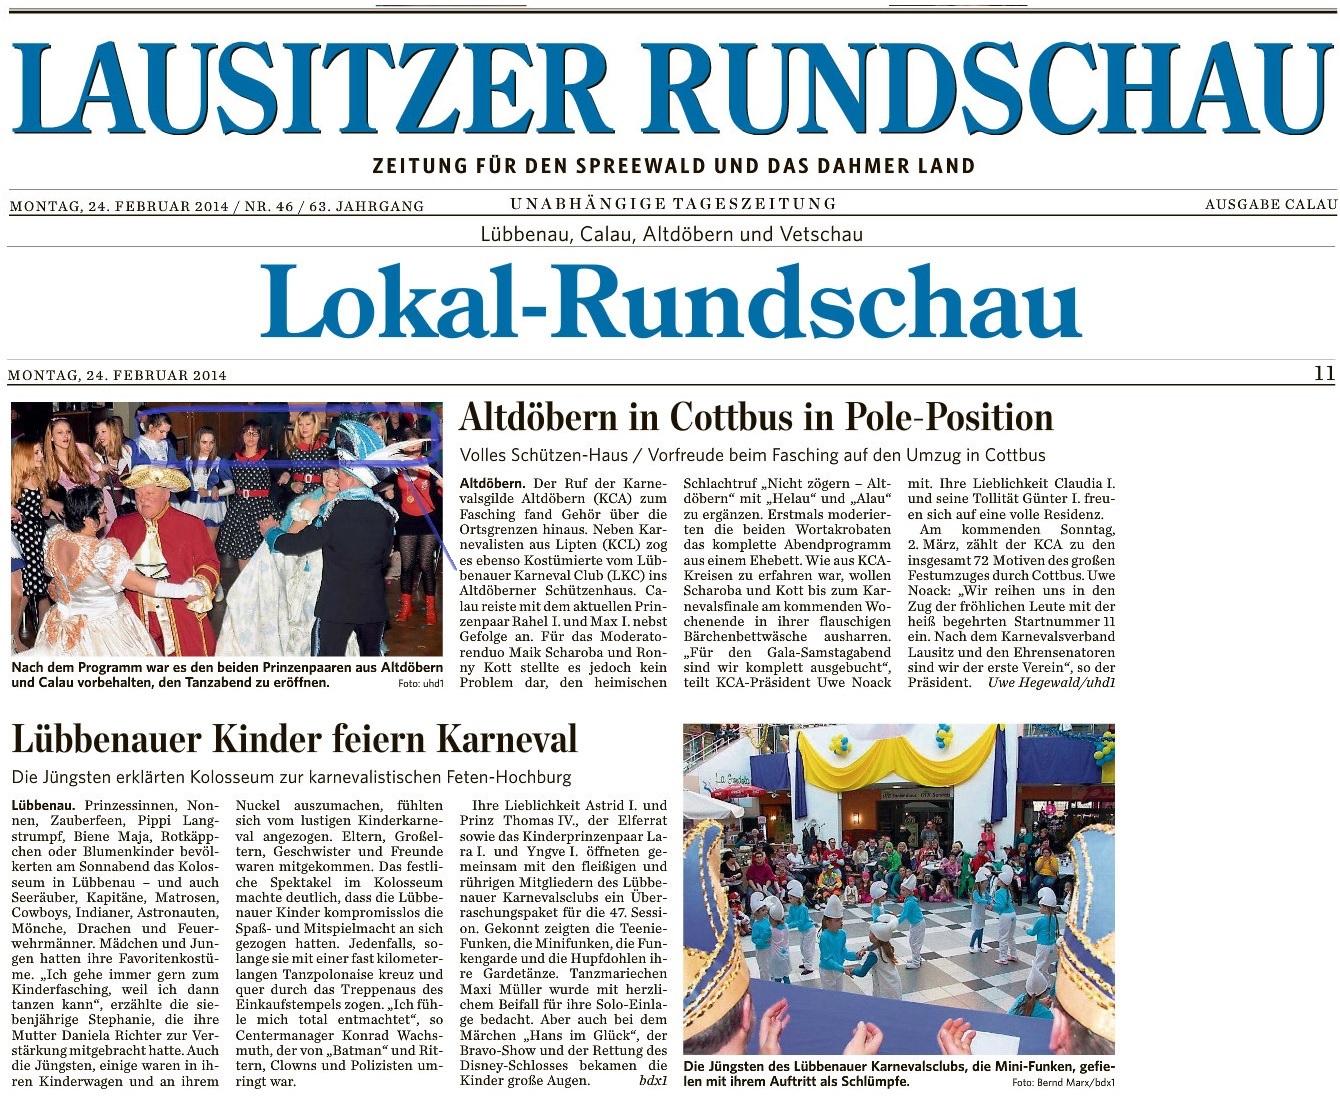 Lausitzer Rundschau Calau